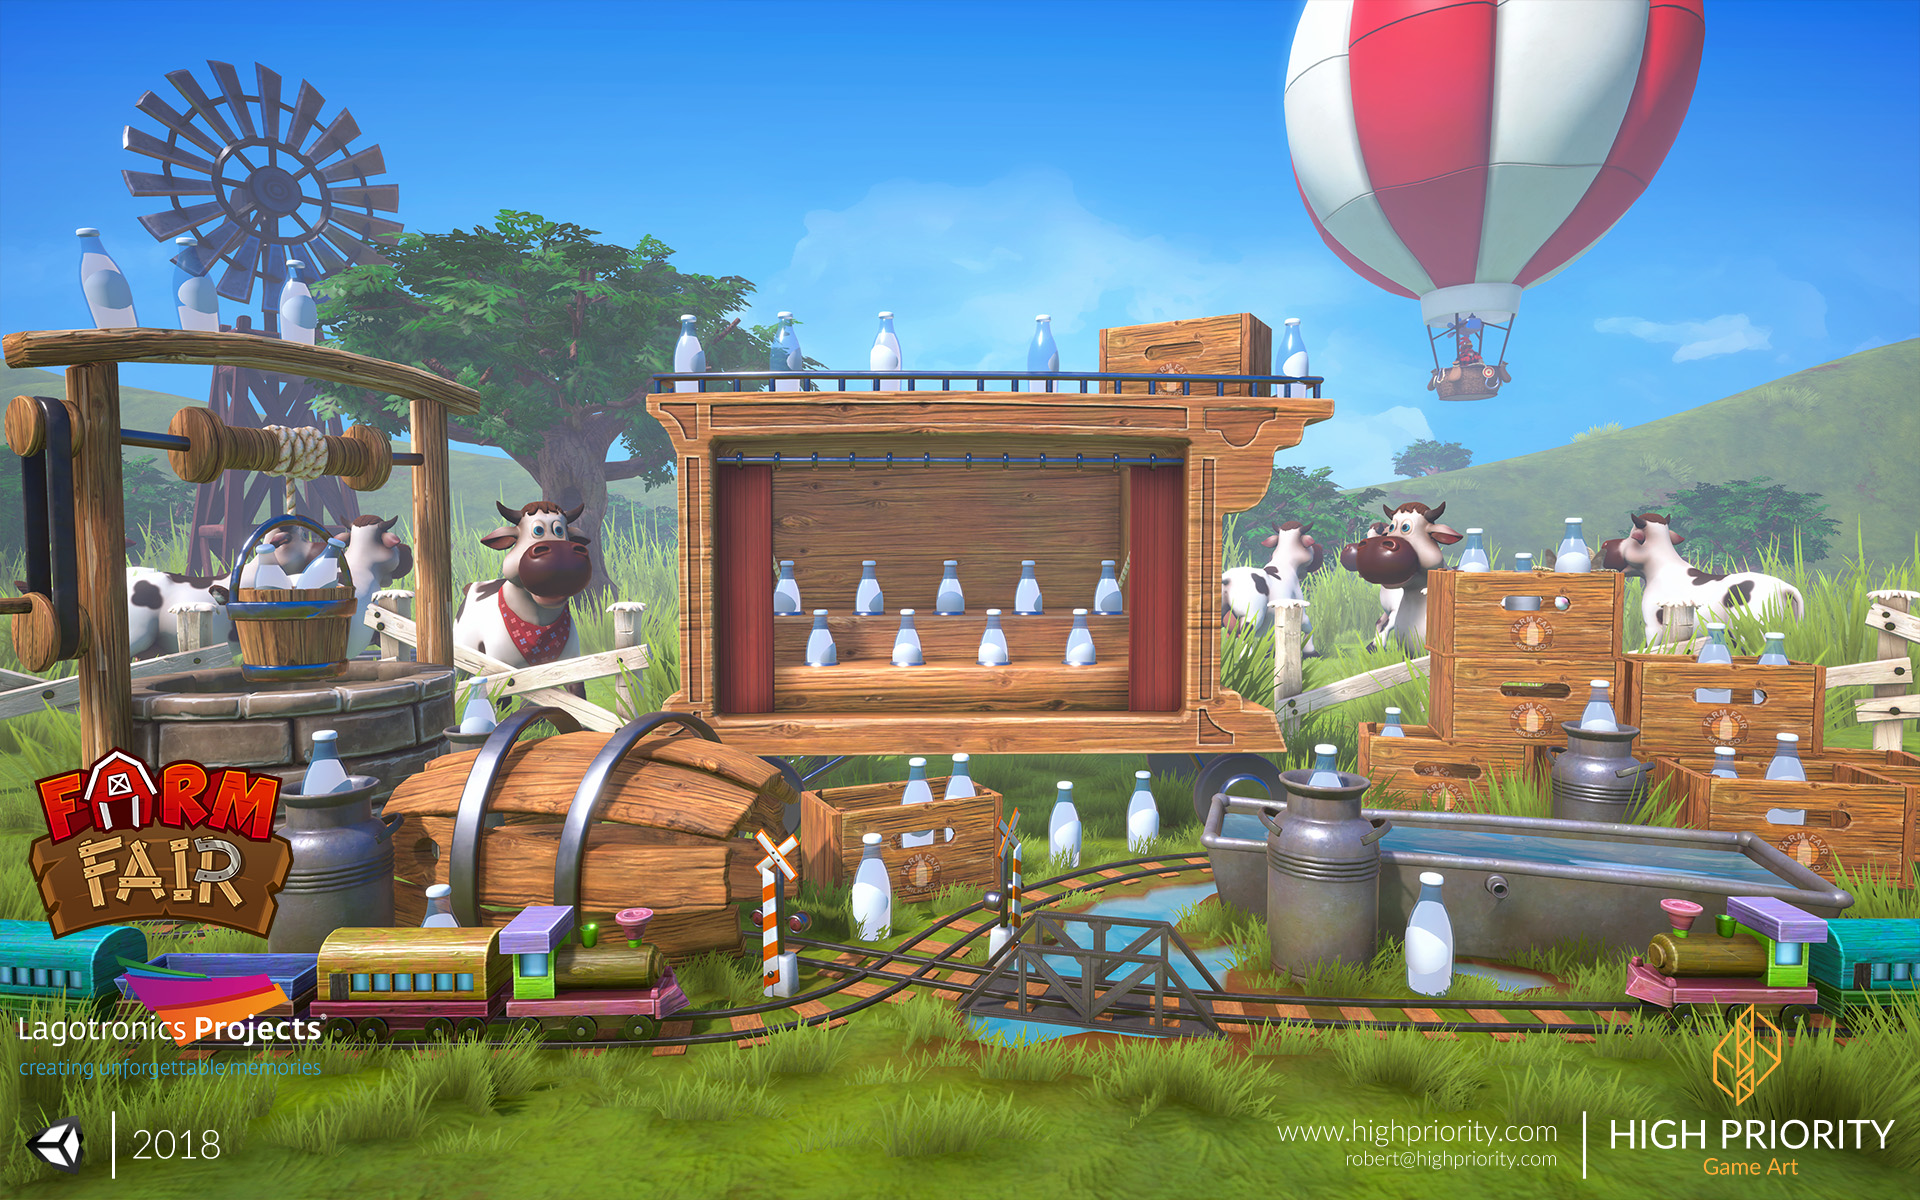 High Priority - Farm Fair - Milk